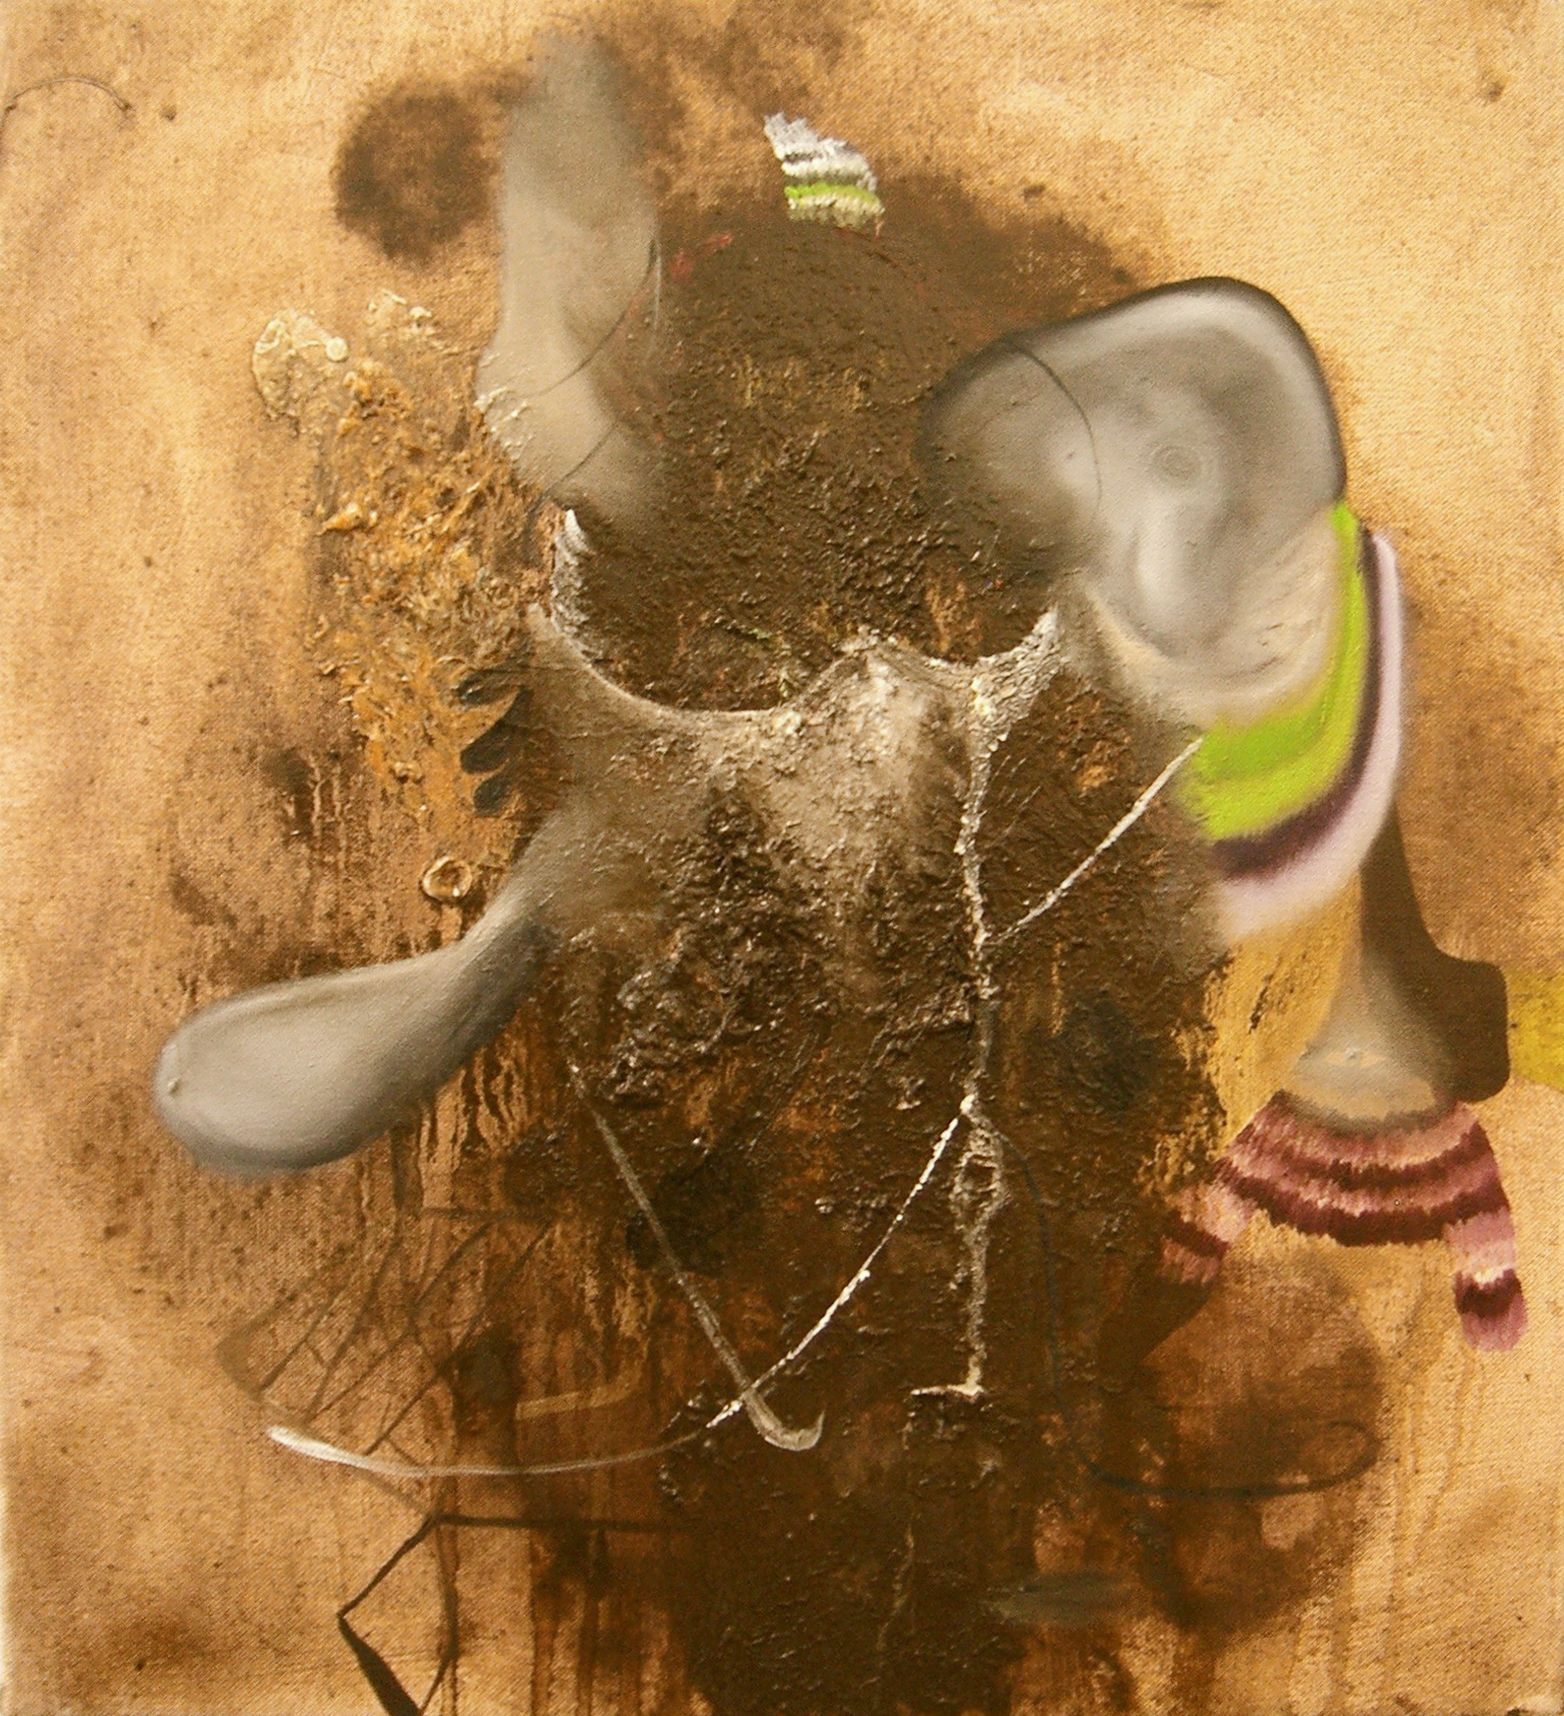 MICHAEL BAUER Rutger Hauer– 10 Million Years, 2007